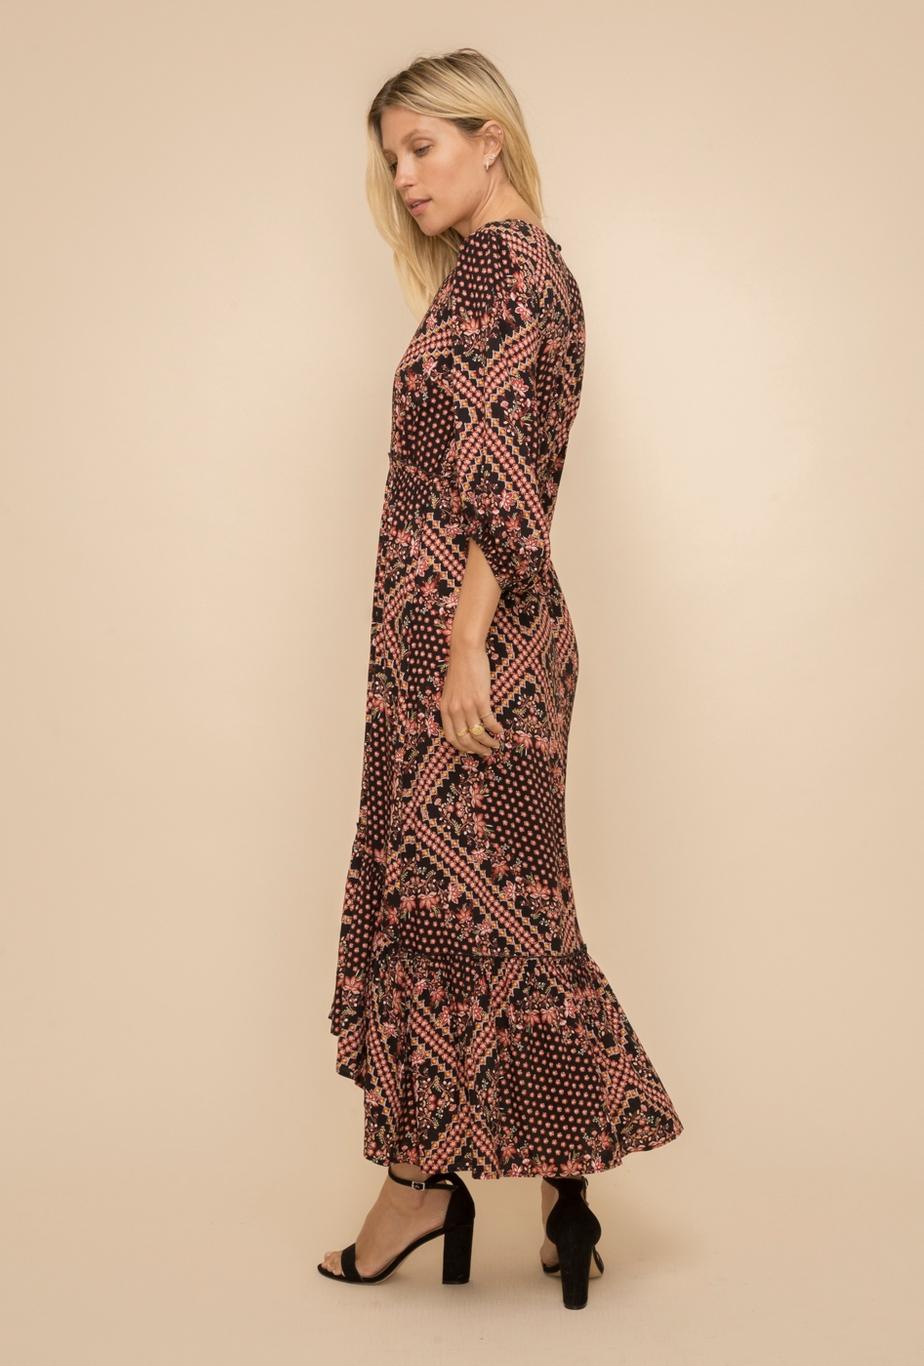 Hem & Thread Patchwork Midi Dress